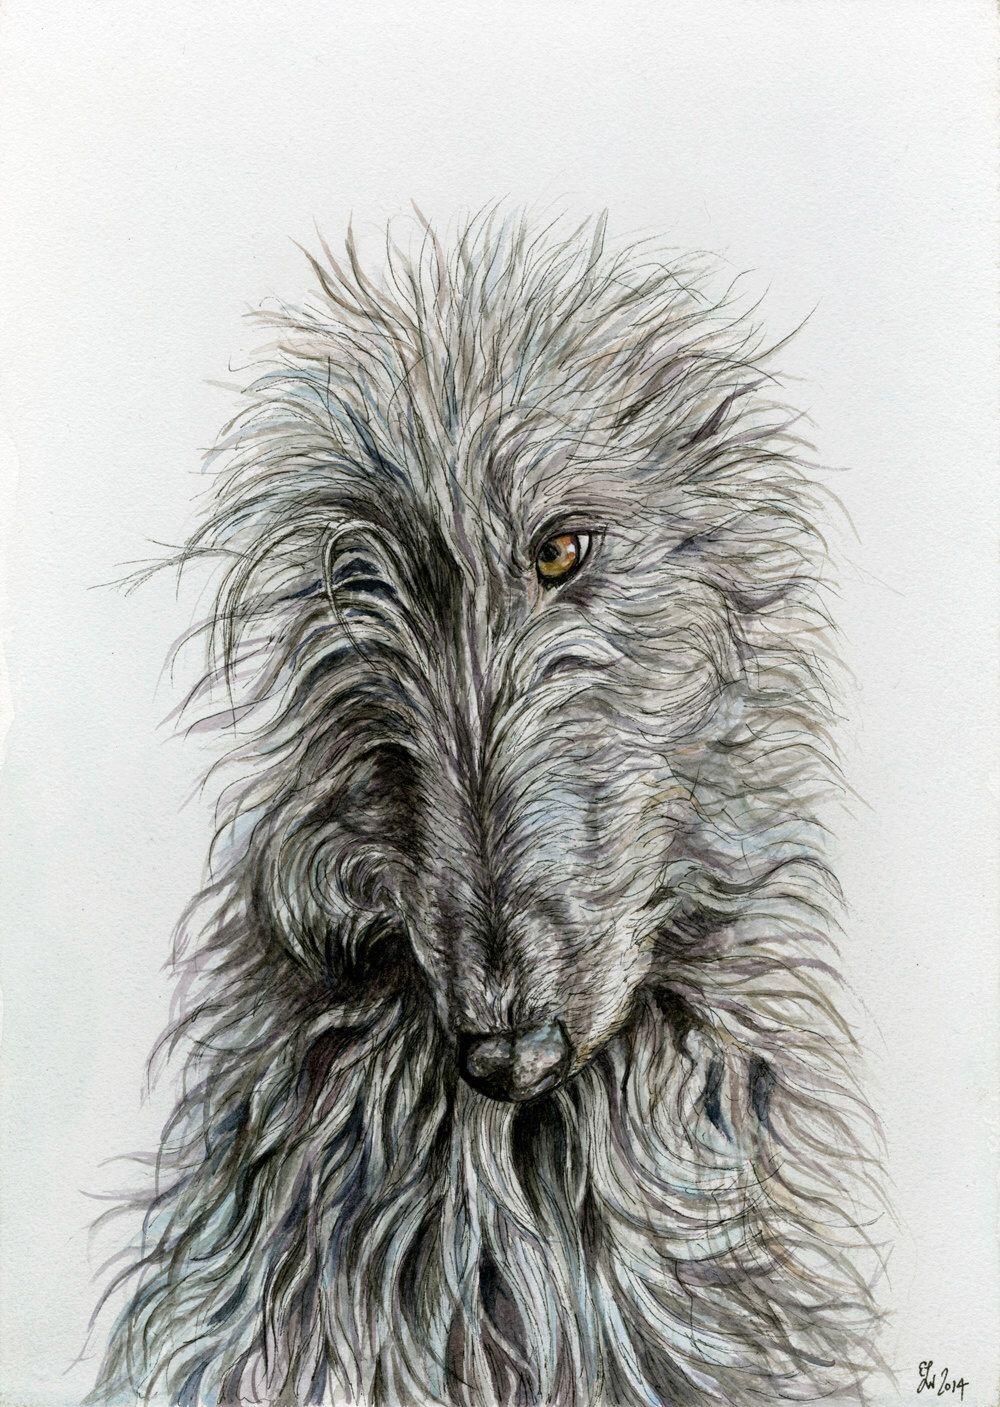 Deerhound Art Print by AlmostAnAngel66 on Etsy https://www.etsy.com/listing/254540392/deerhound-art-print